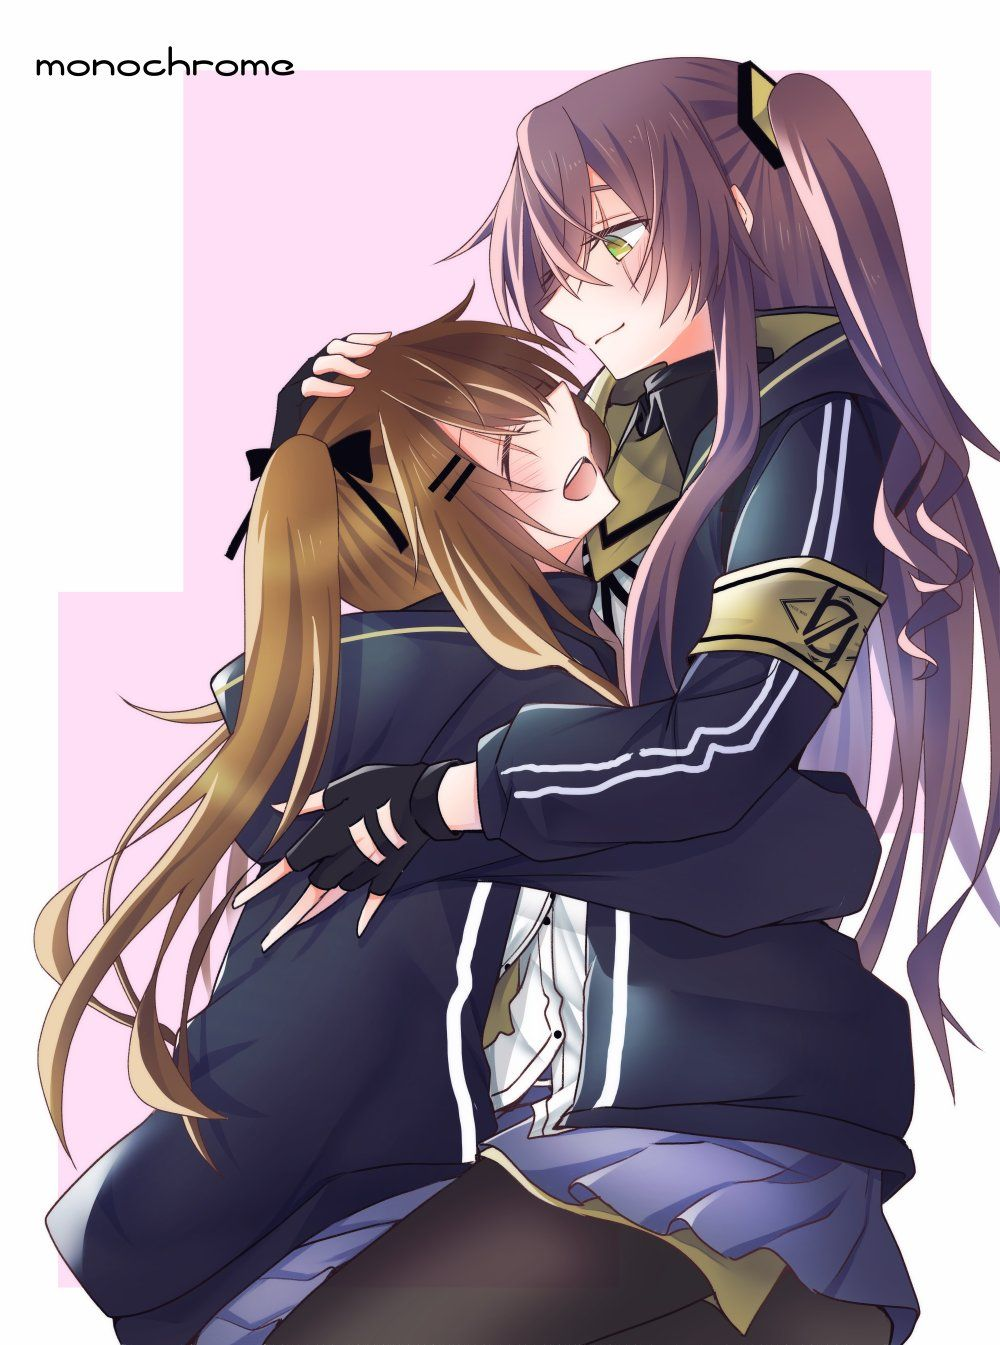 UMP 9 and 45 hugging [Girls Frontline] Sauce https